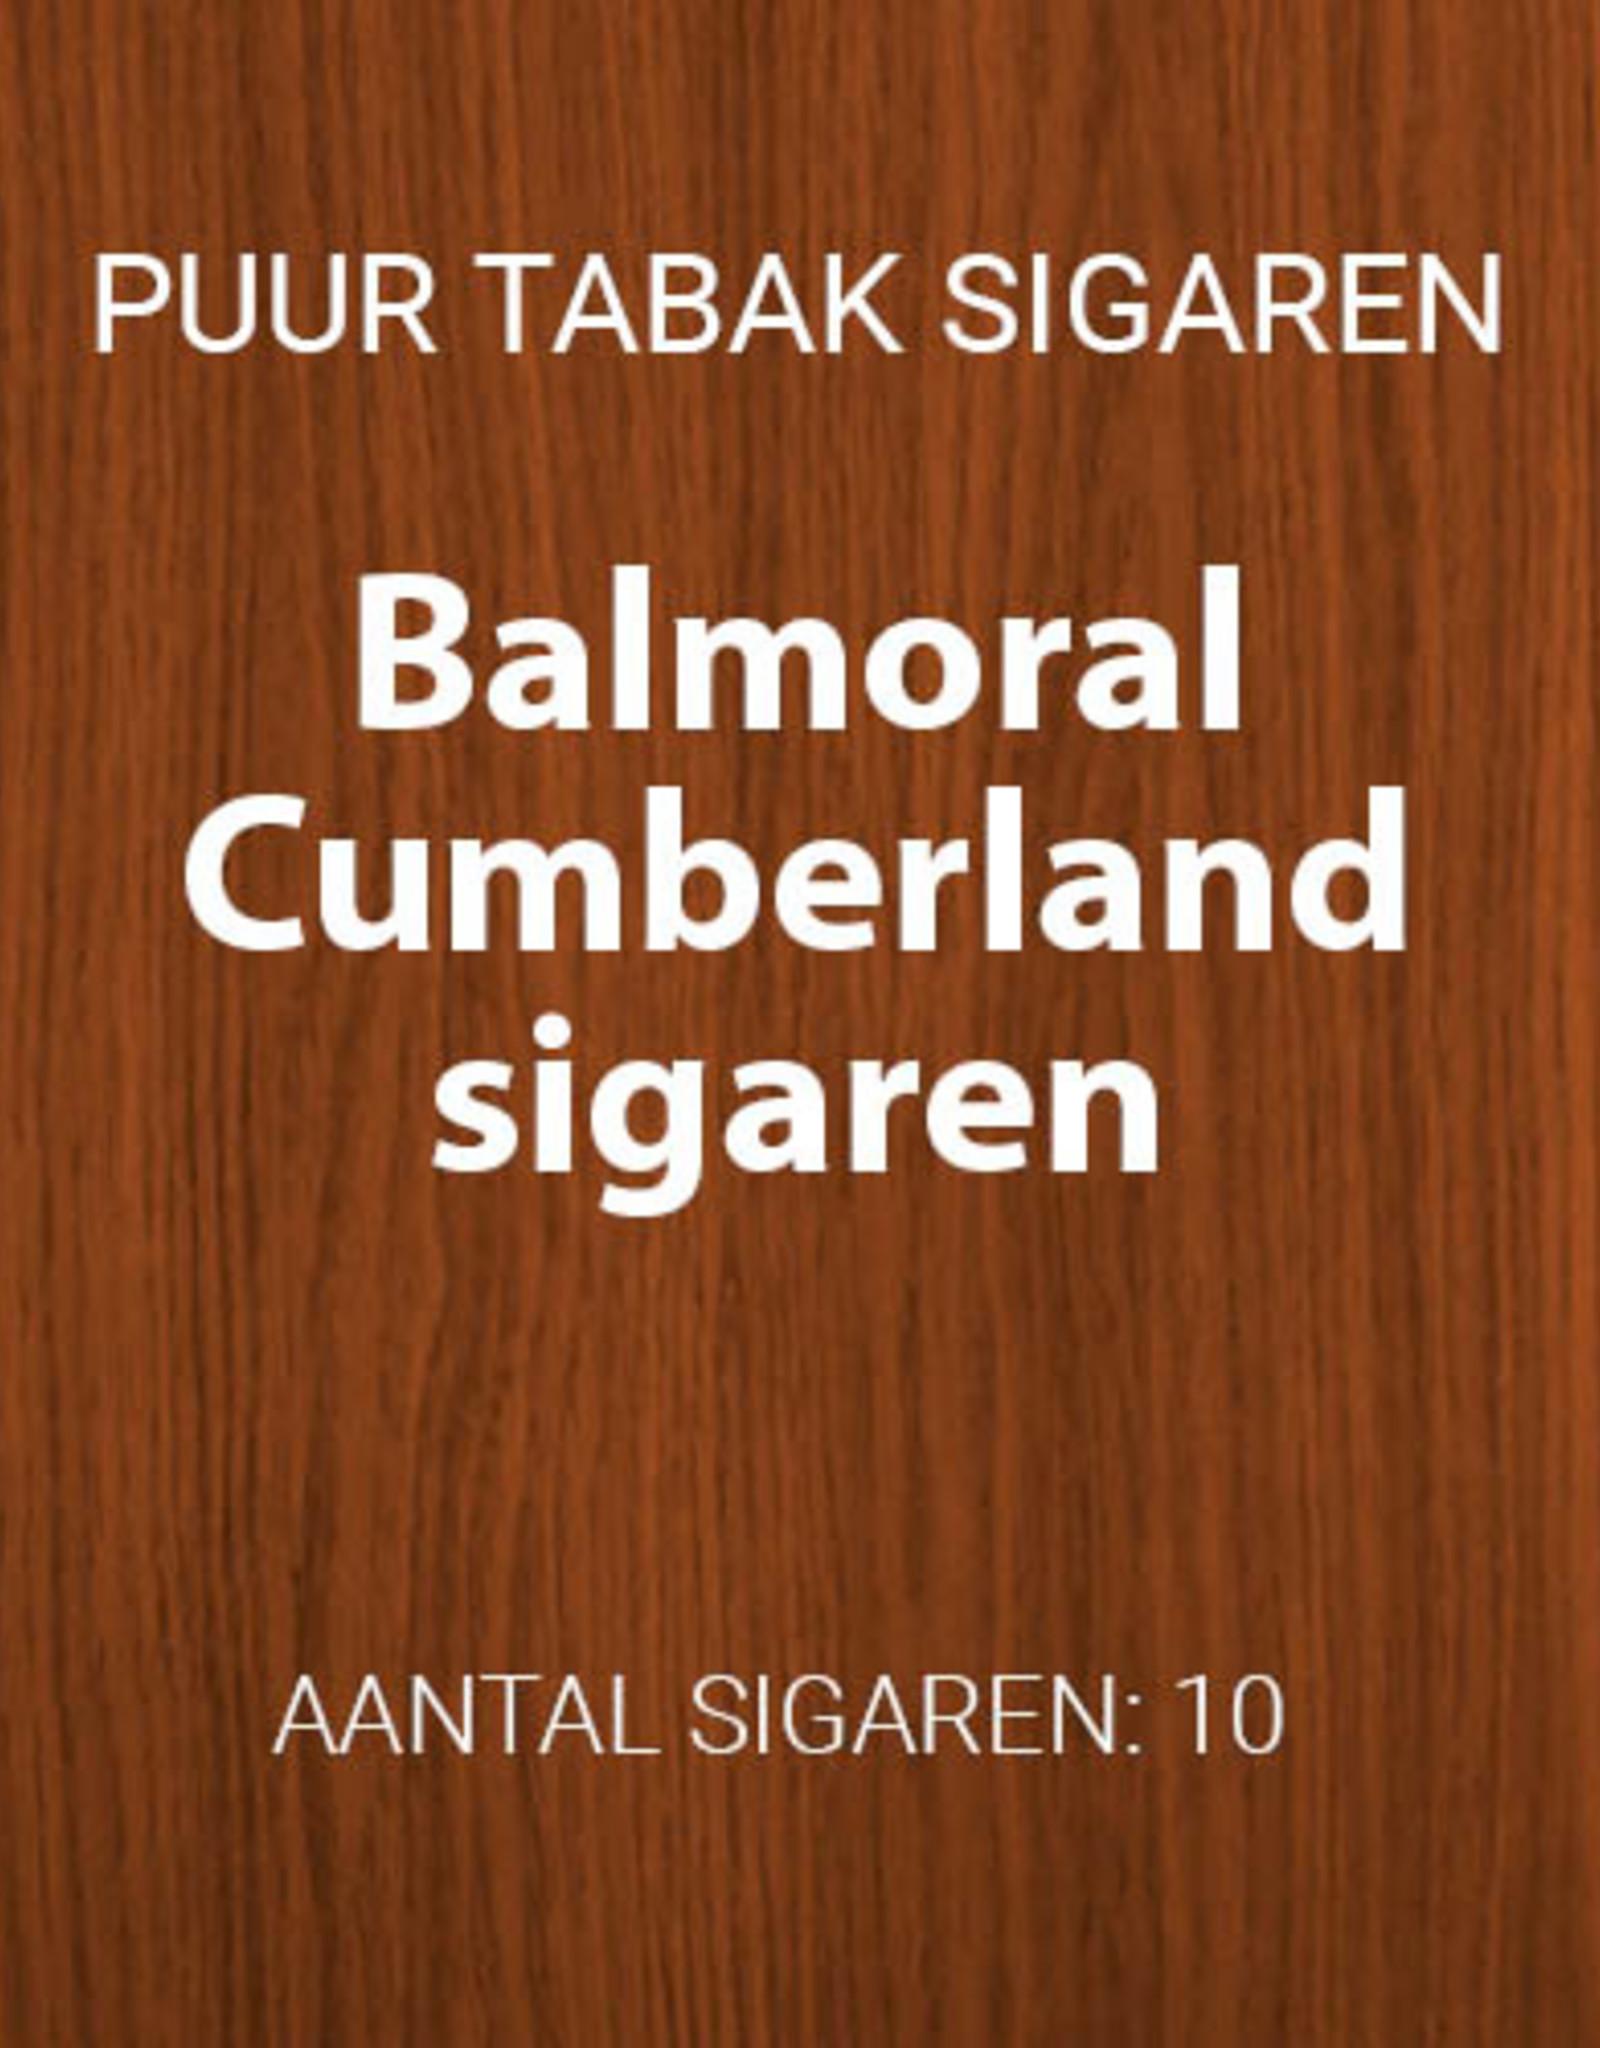 Balmoral Cumberland petit panatella